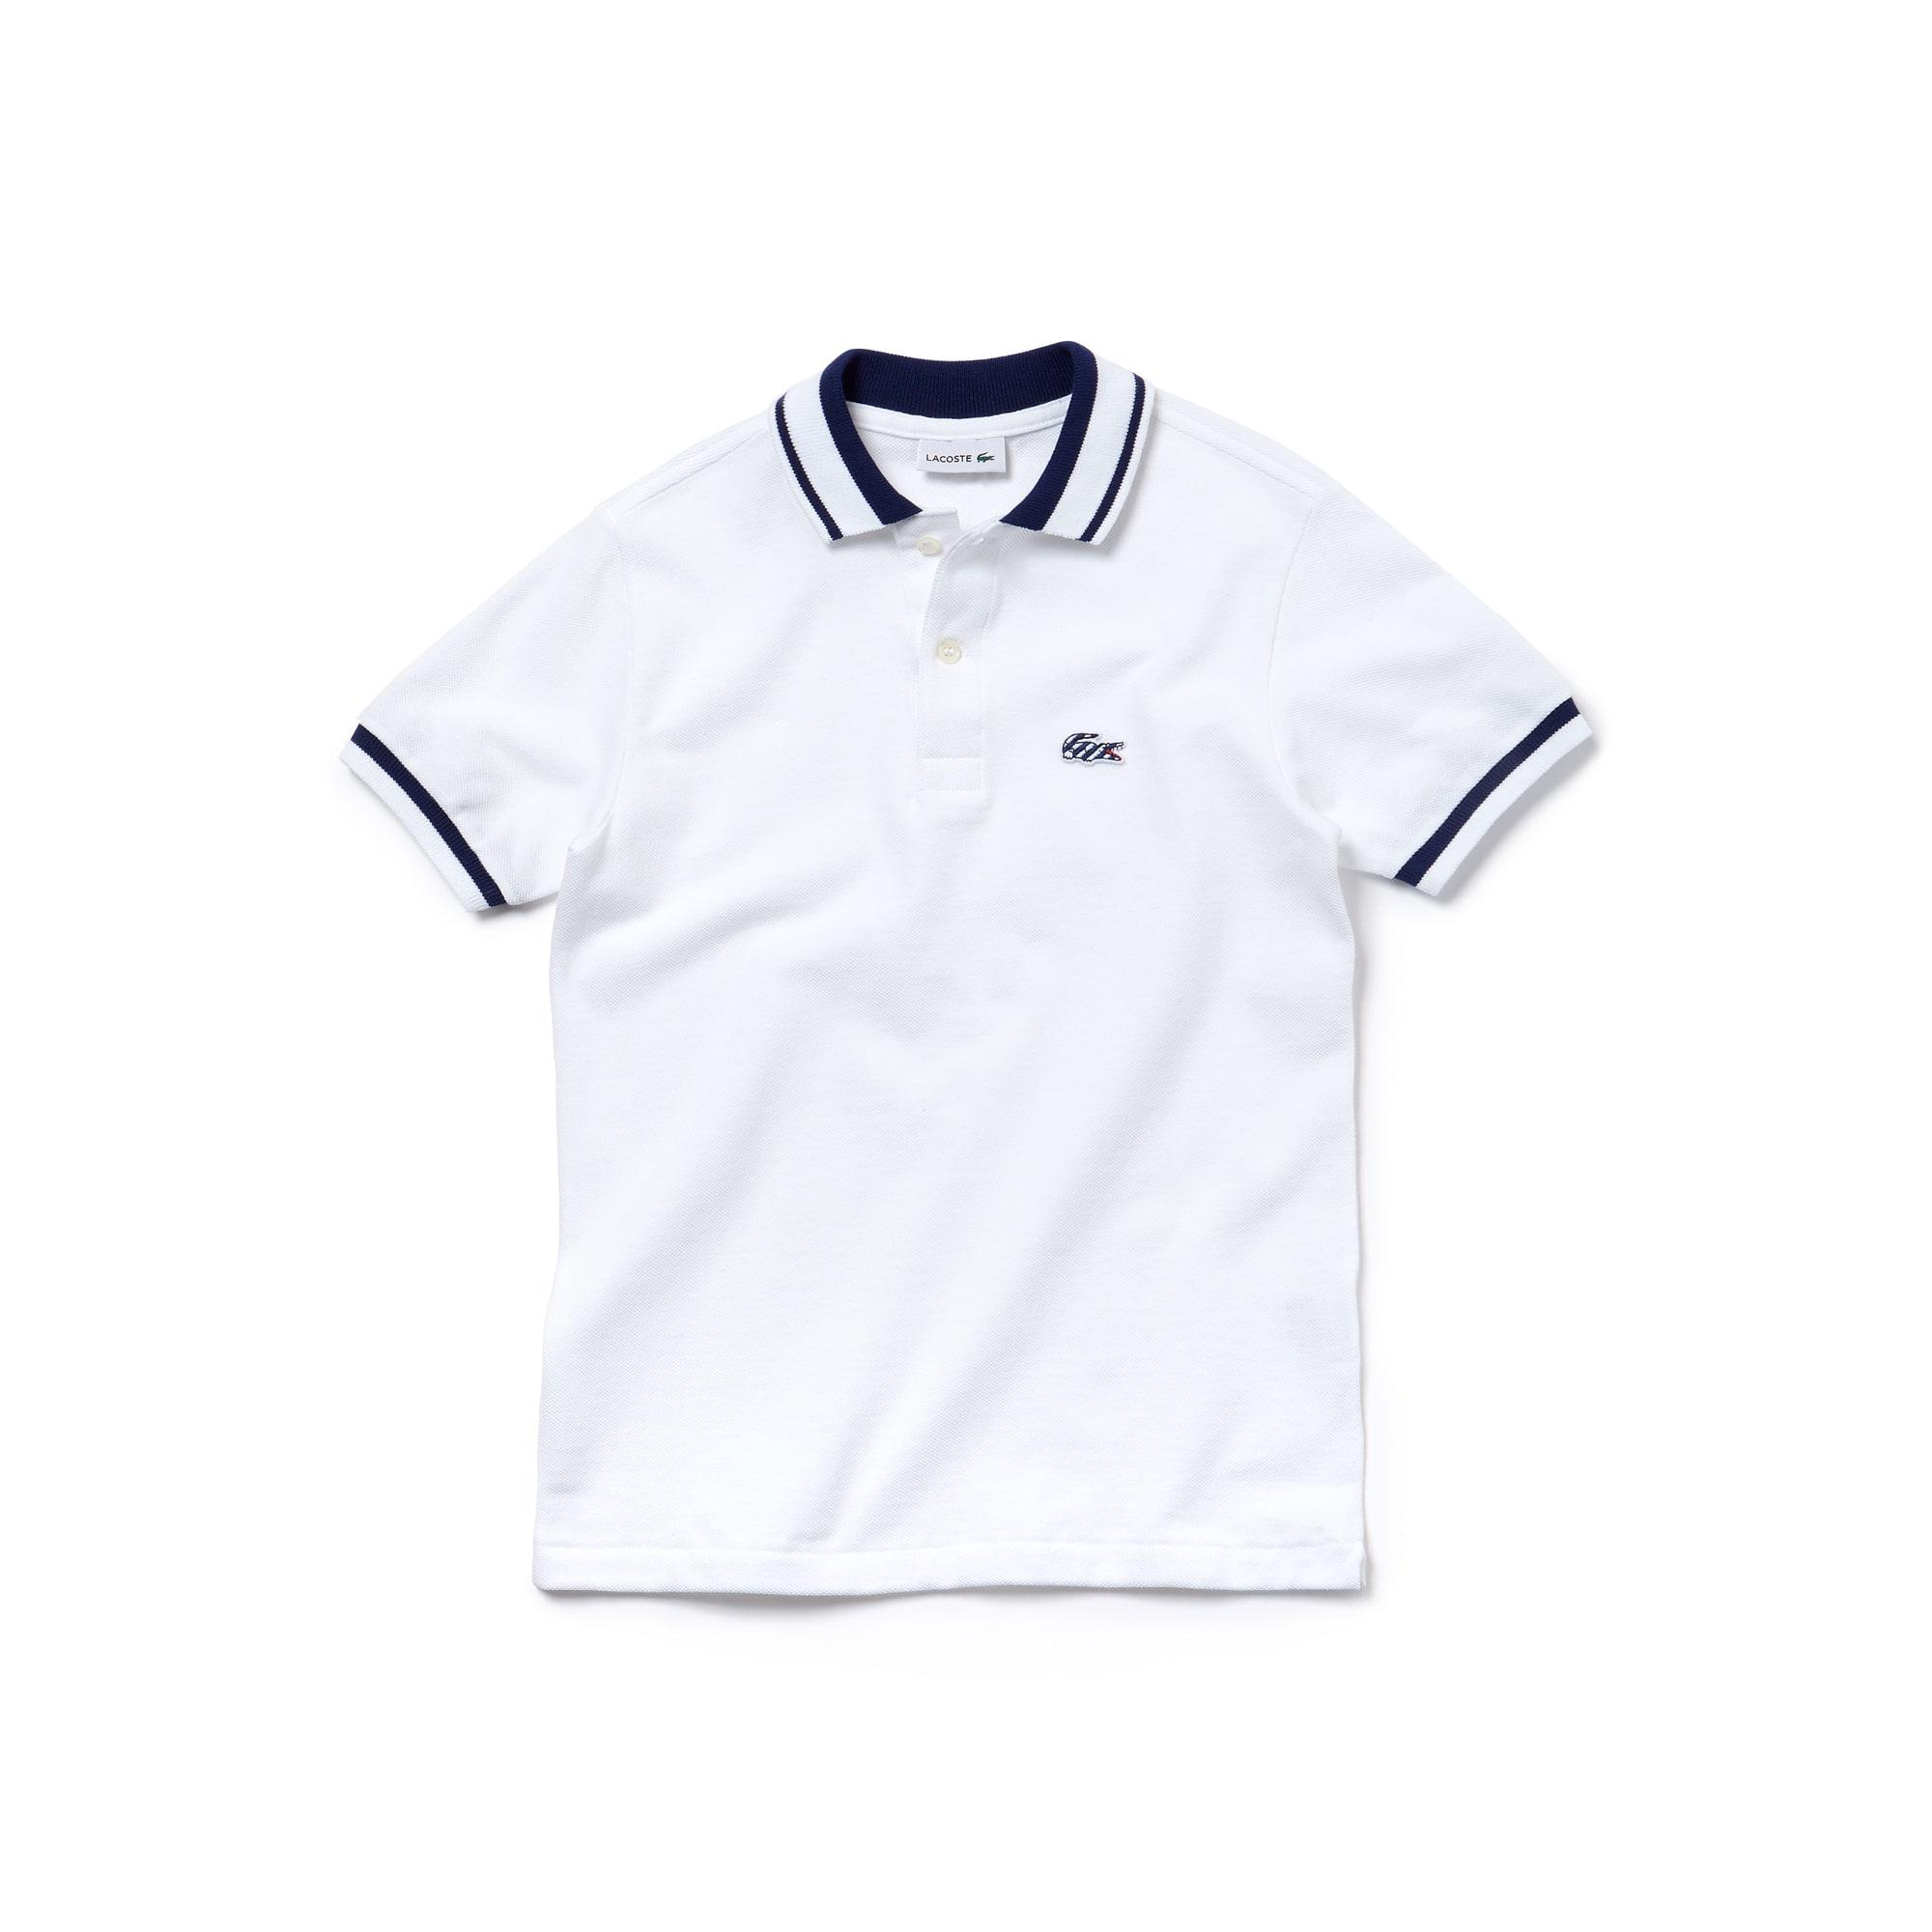 Polo classic fit Kids Lacoste in petit piqué a 2 capi